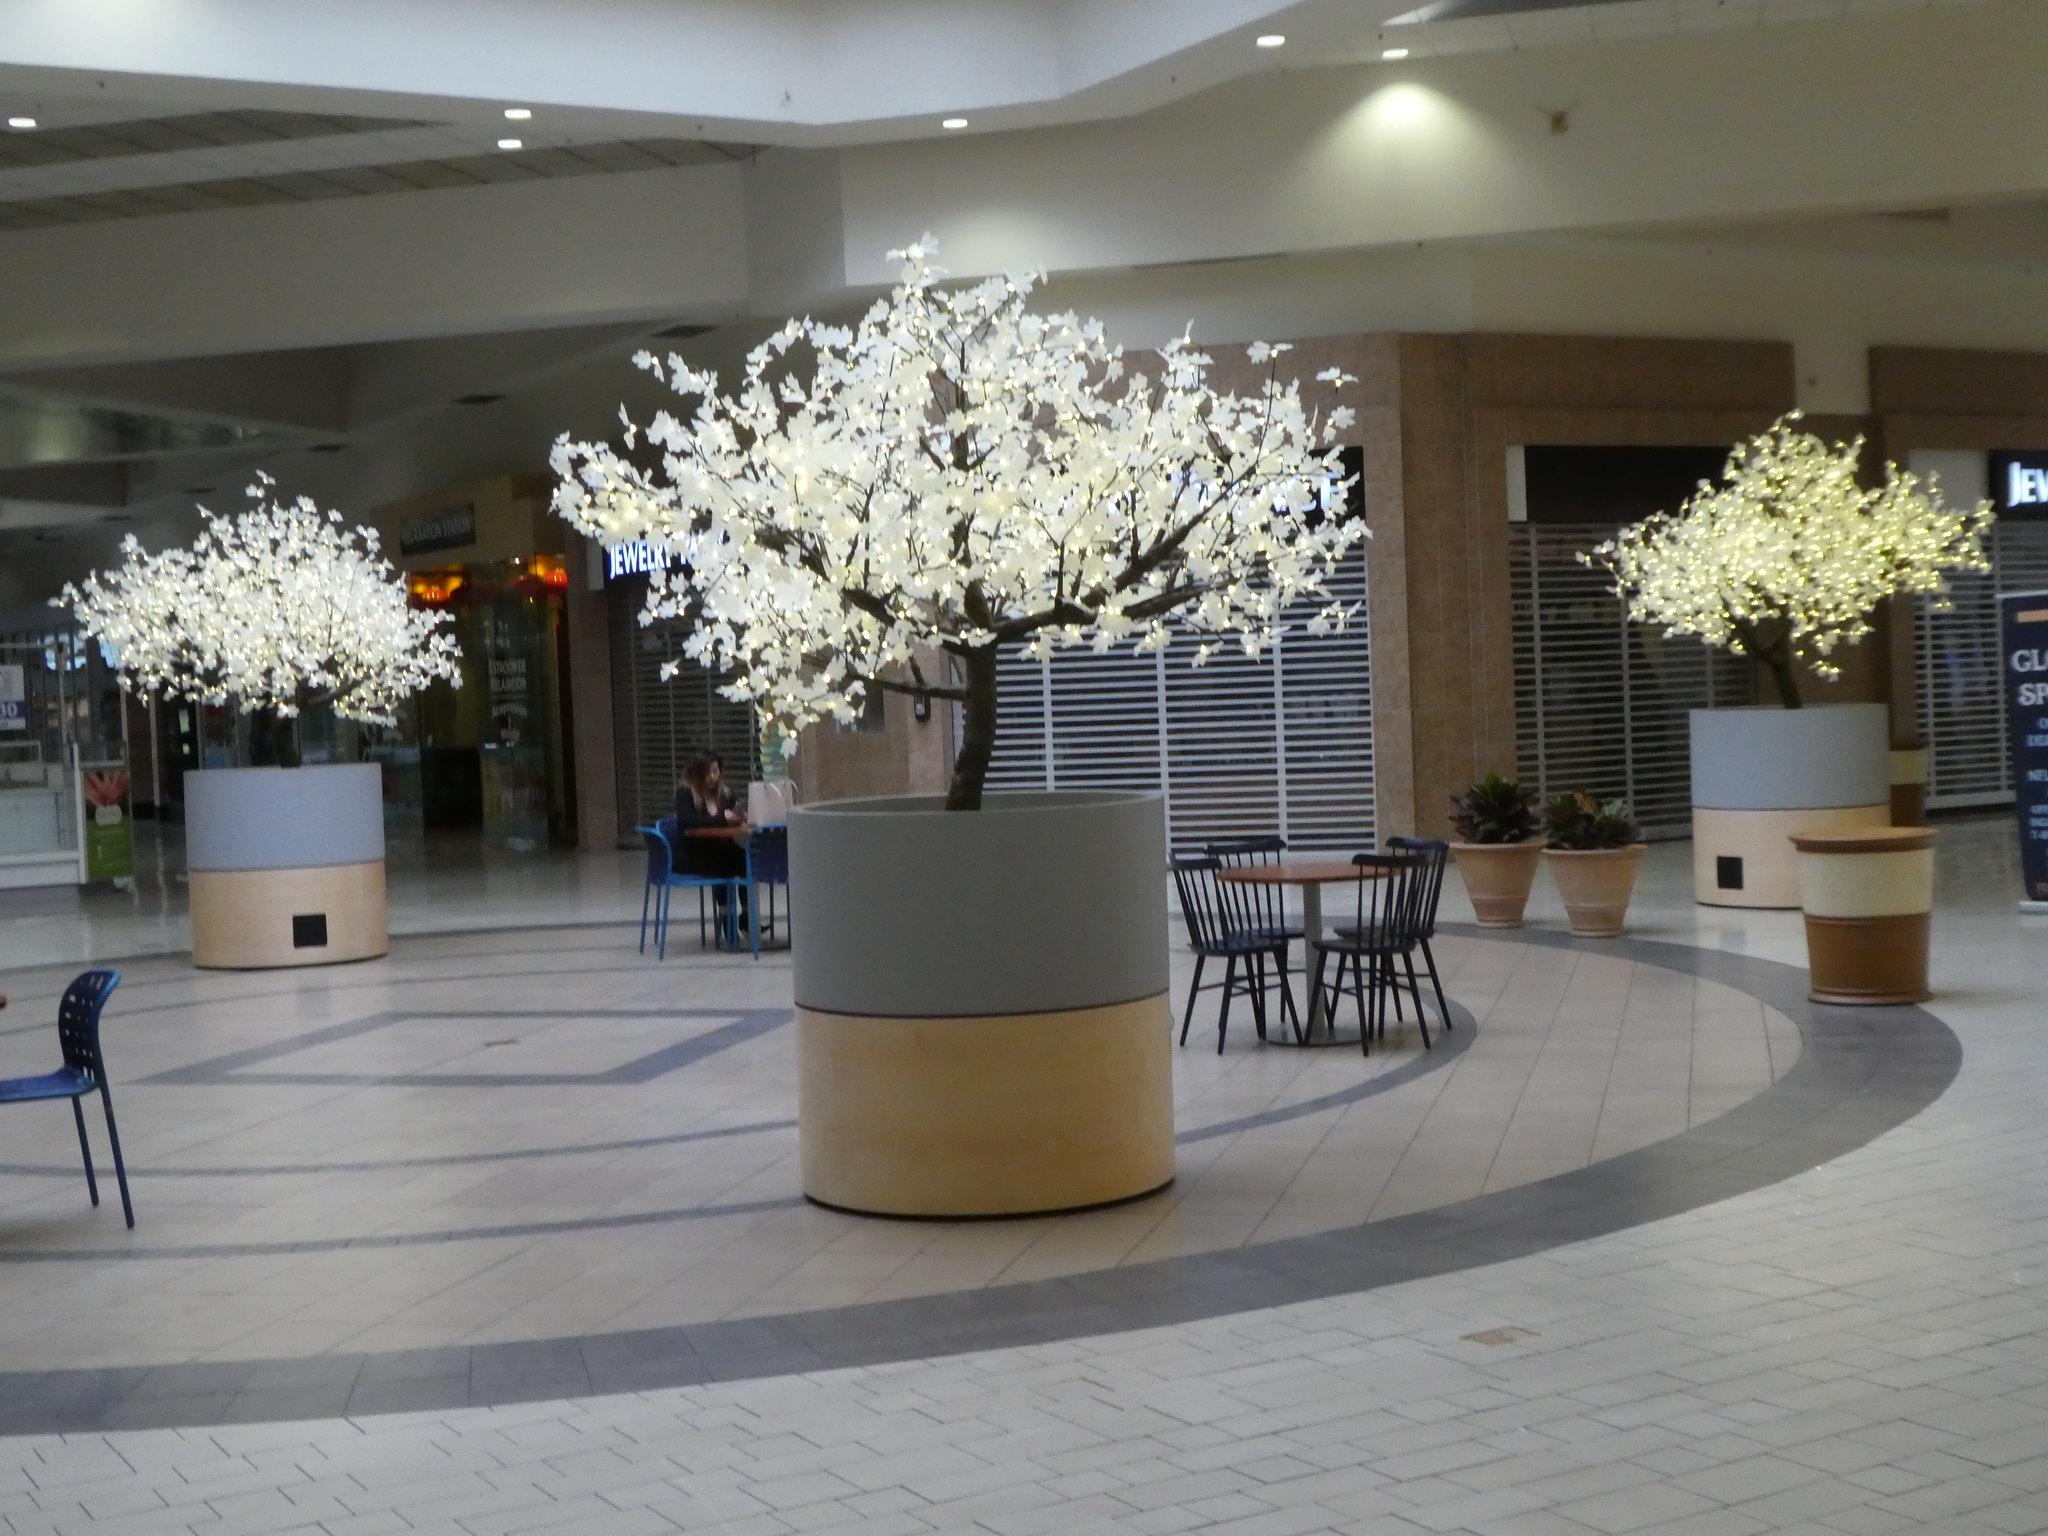 6 April 2018 - Somersville Towne Center